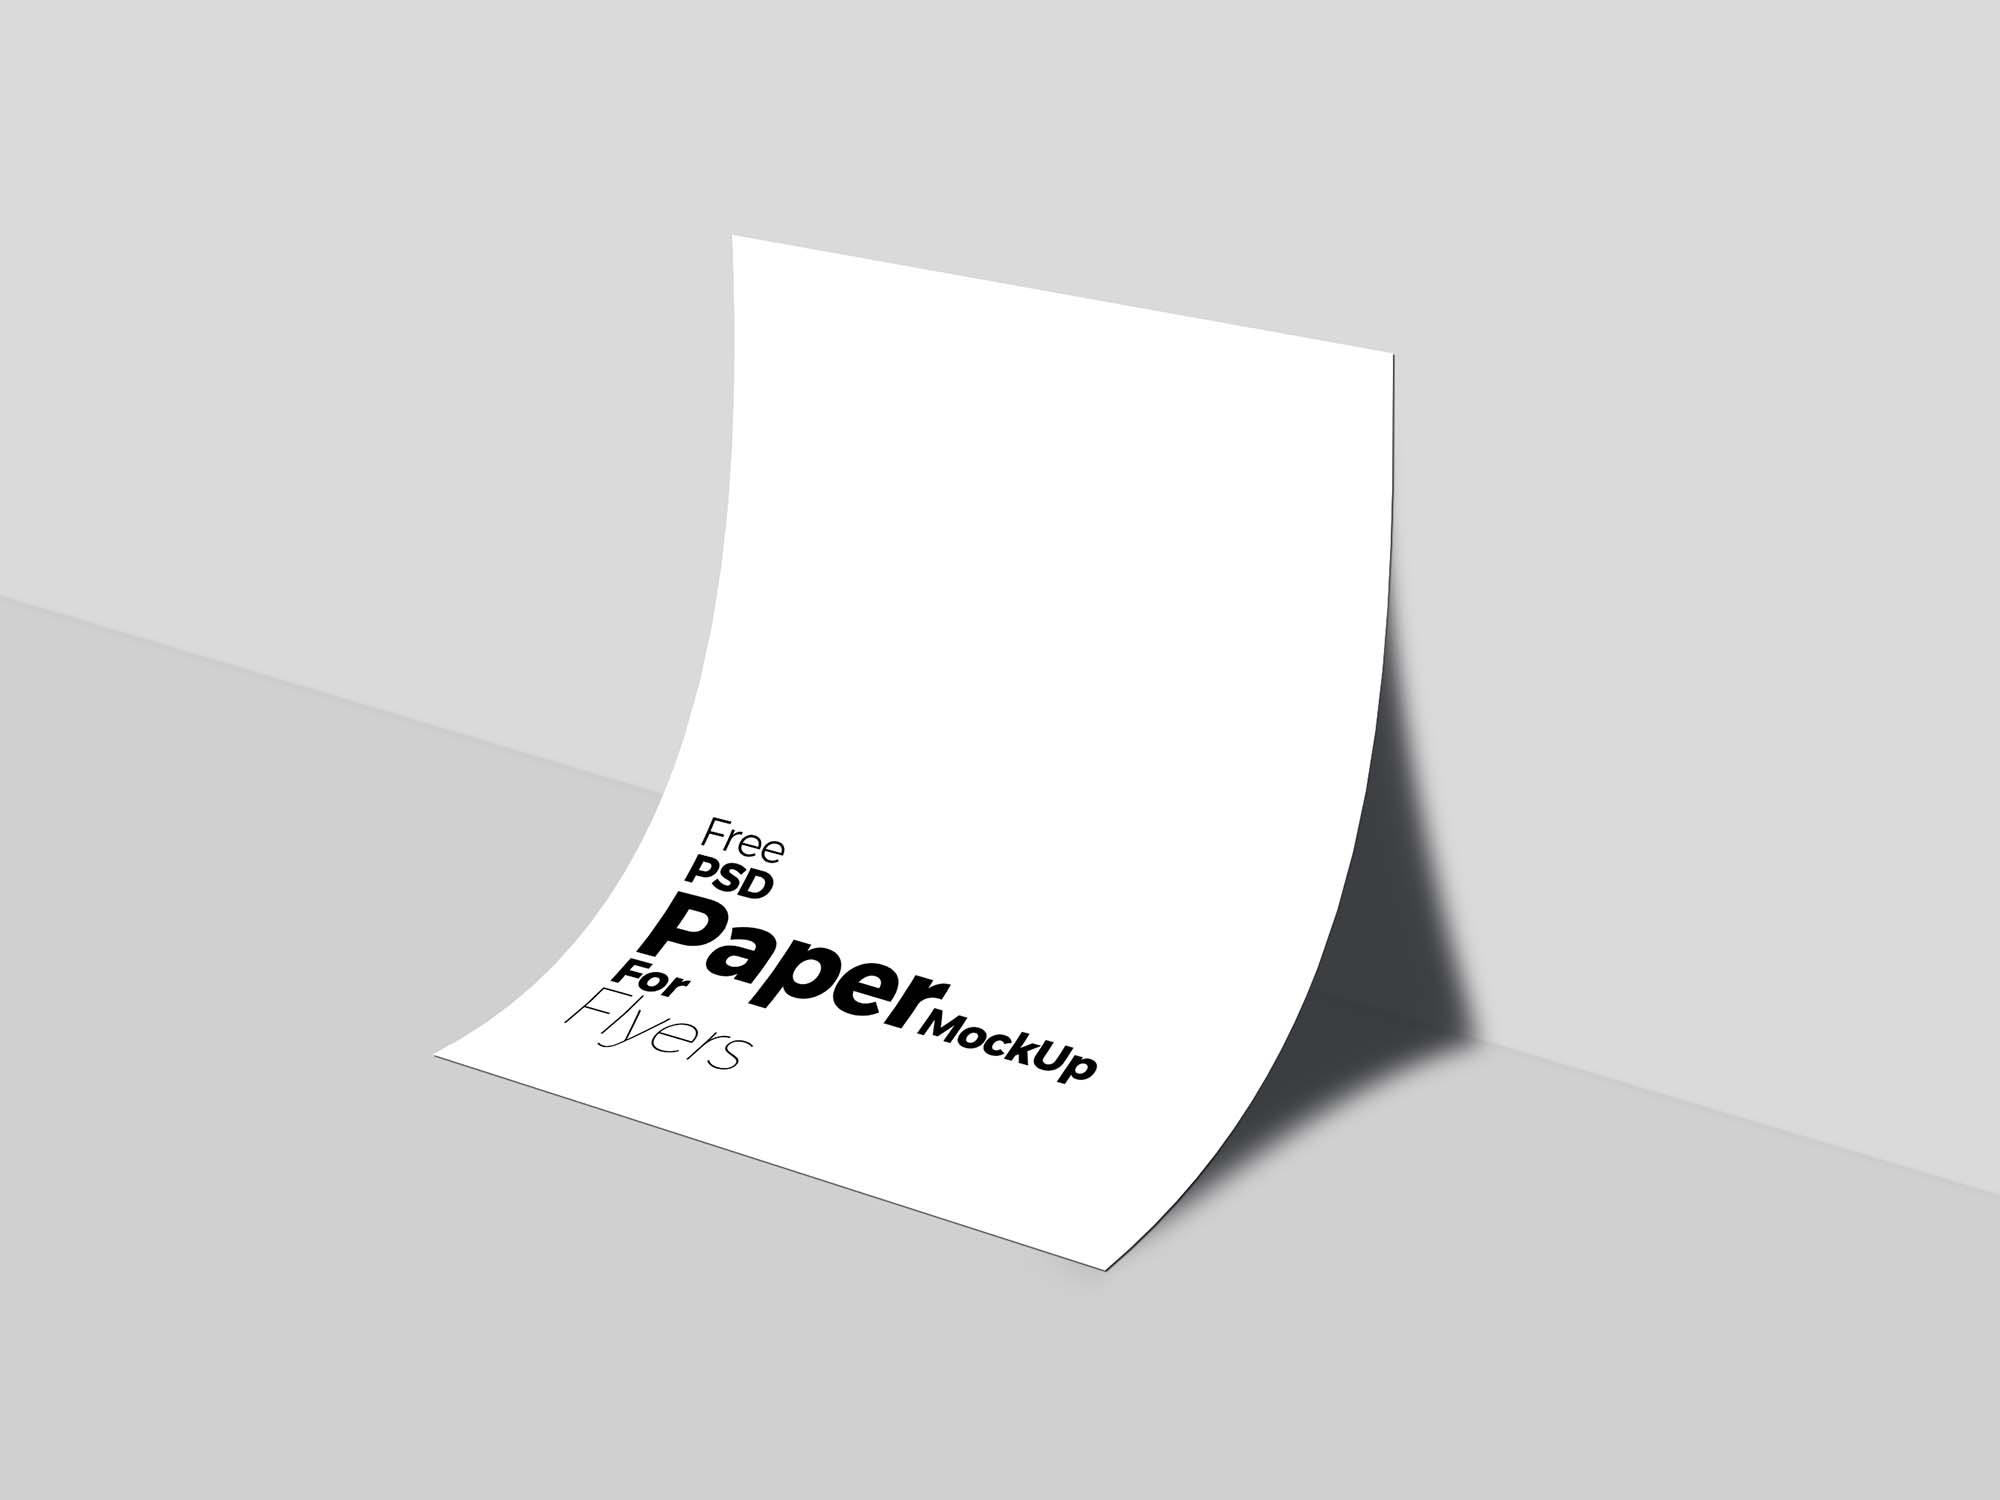 Free PSD A4 Paper MockUp